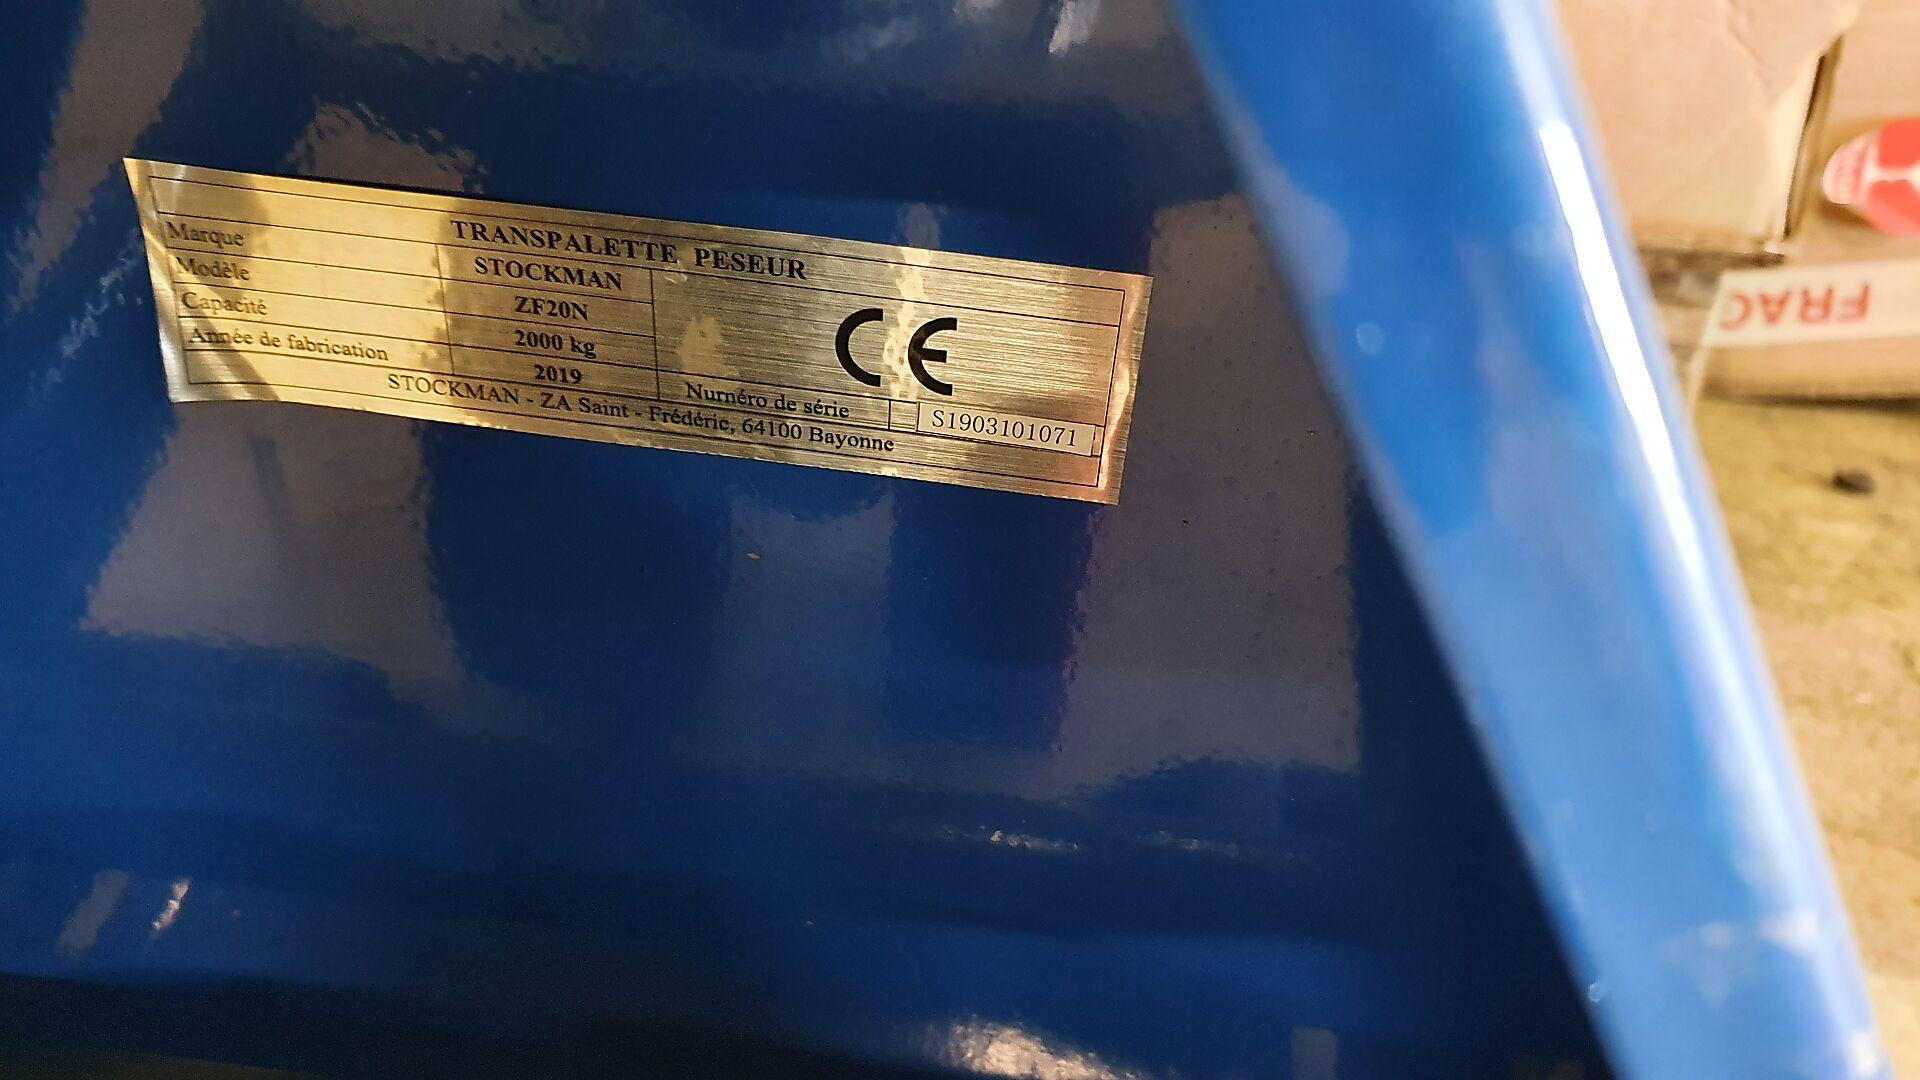 transpalette manuel peseur Stockm ZF20N location vente neuf ou occasion